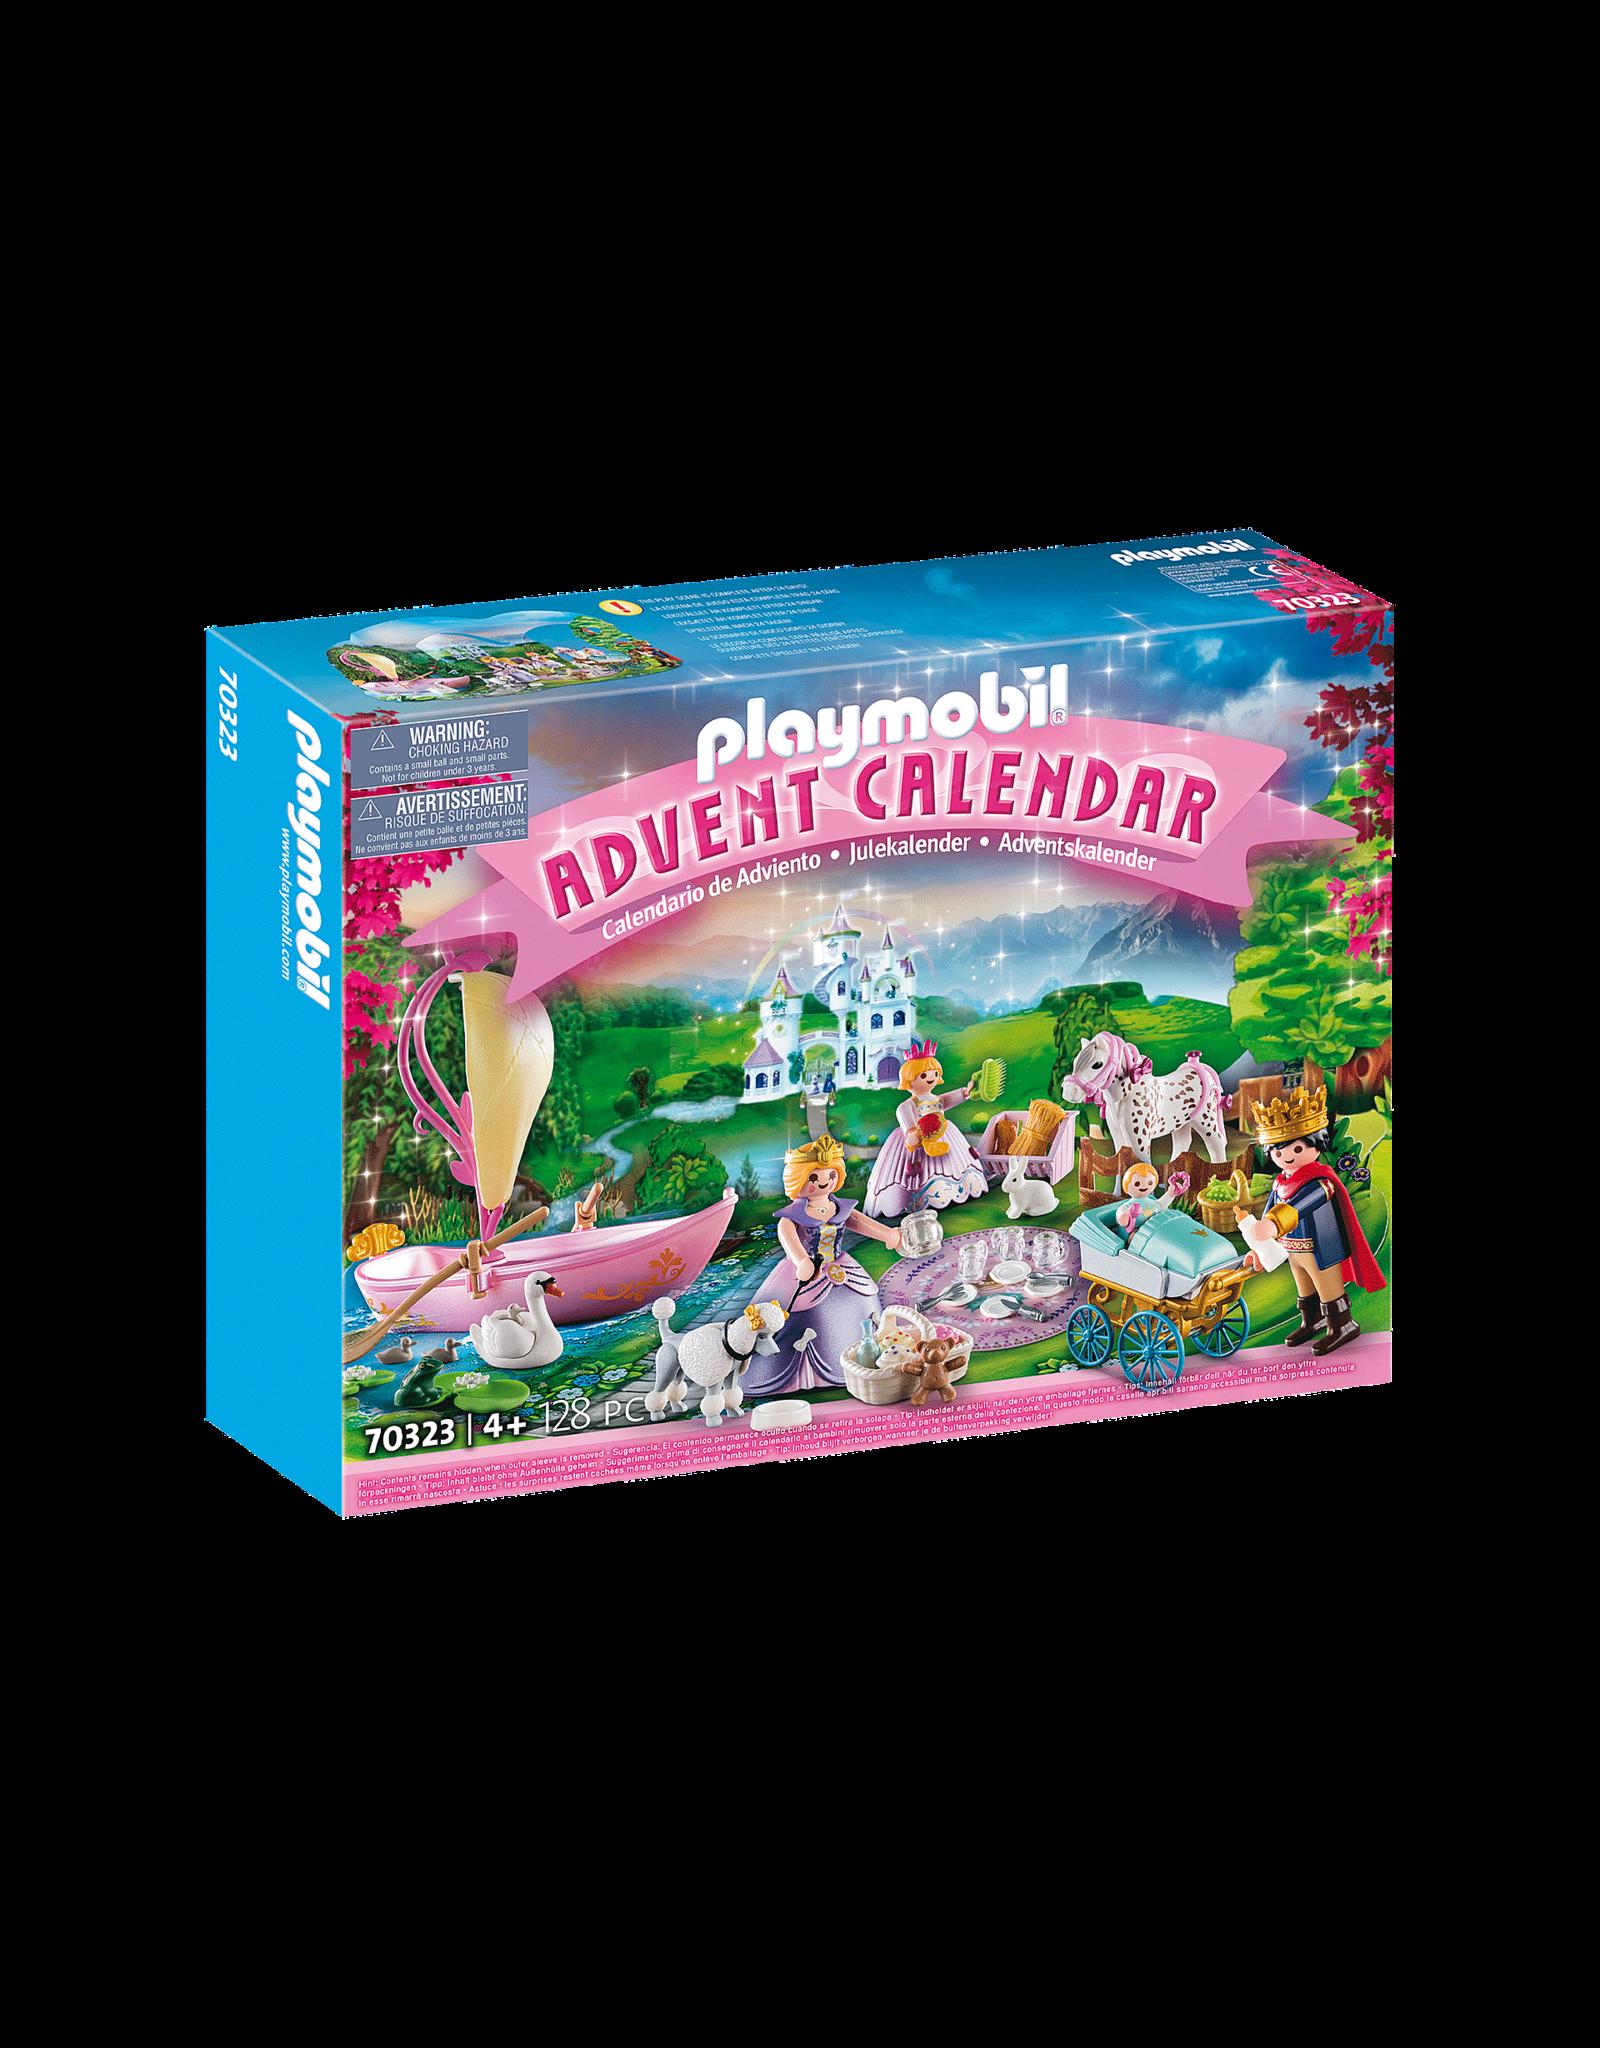 Playmobil Playmobil Advent Calendar - Royal Picnic